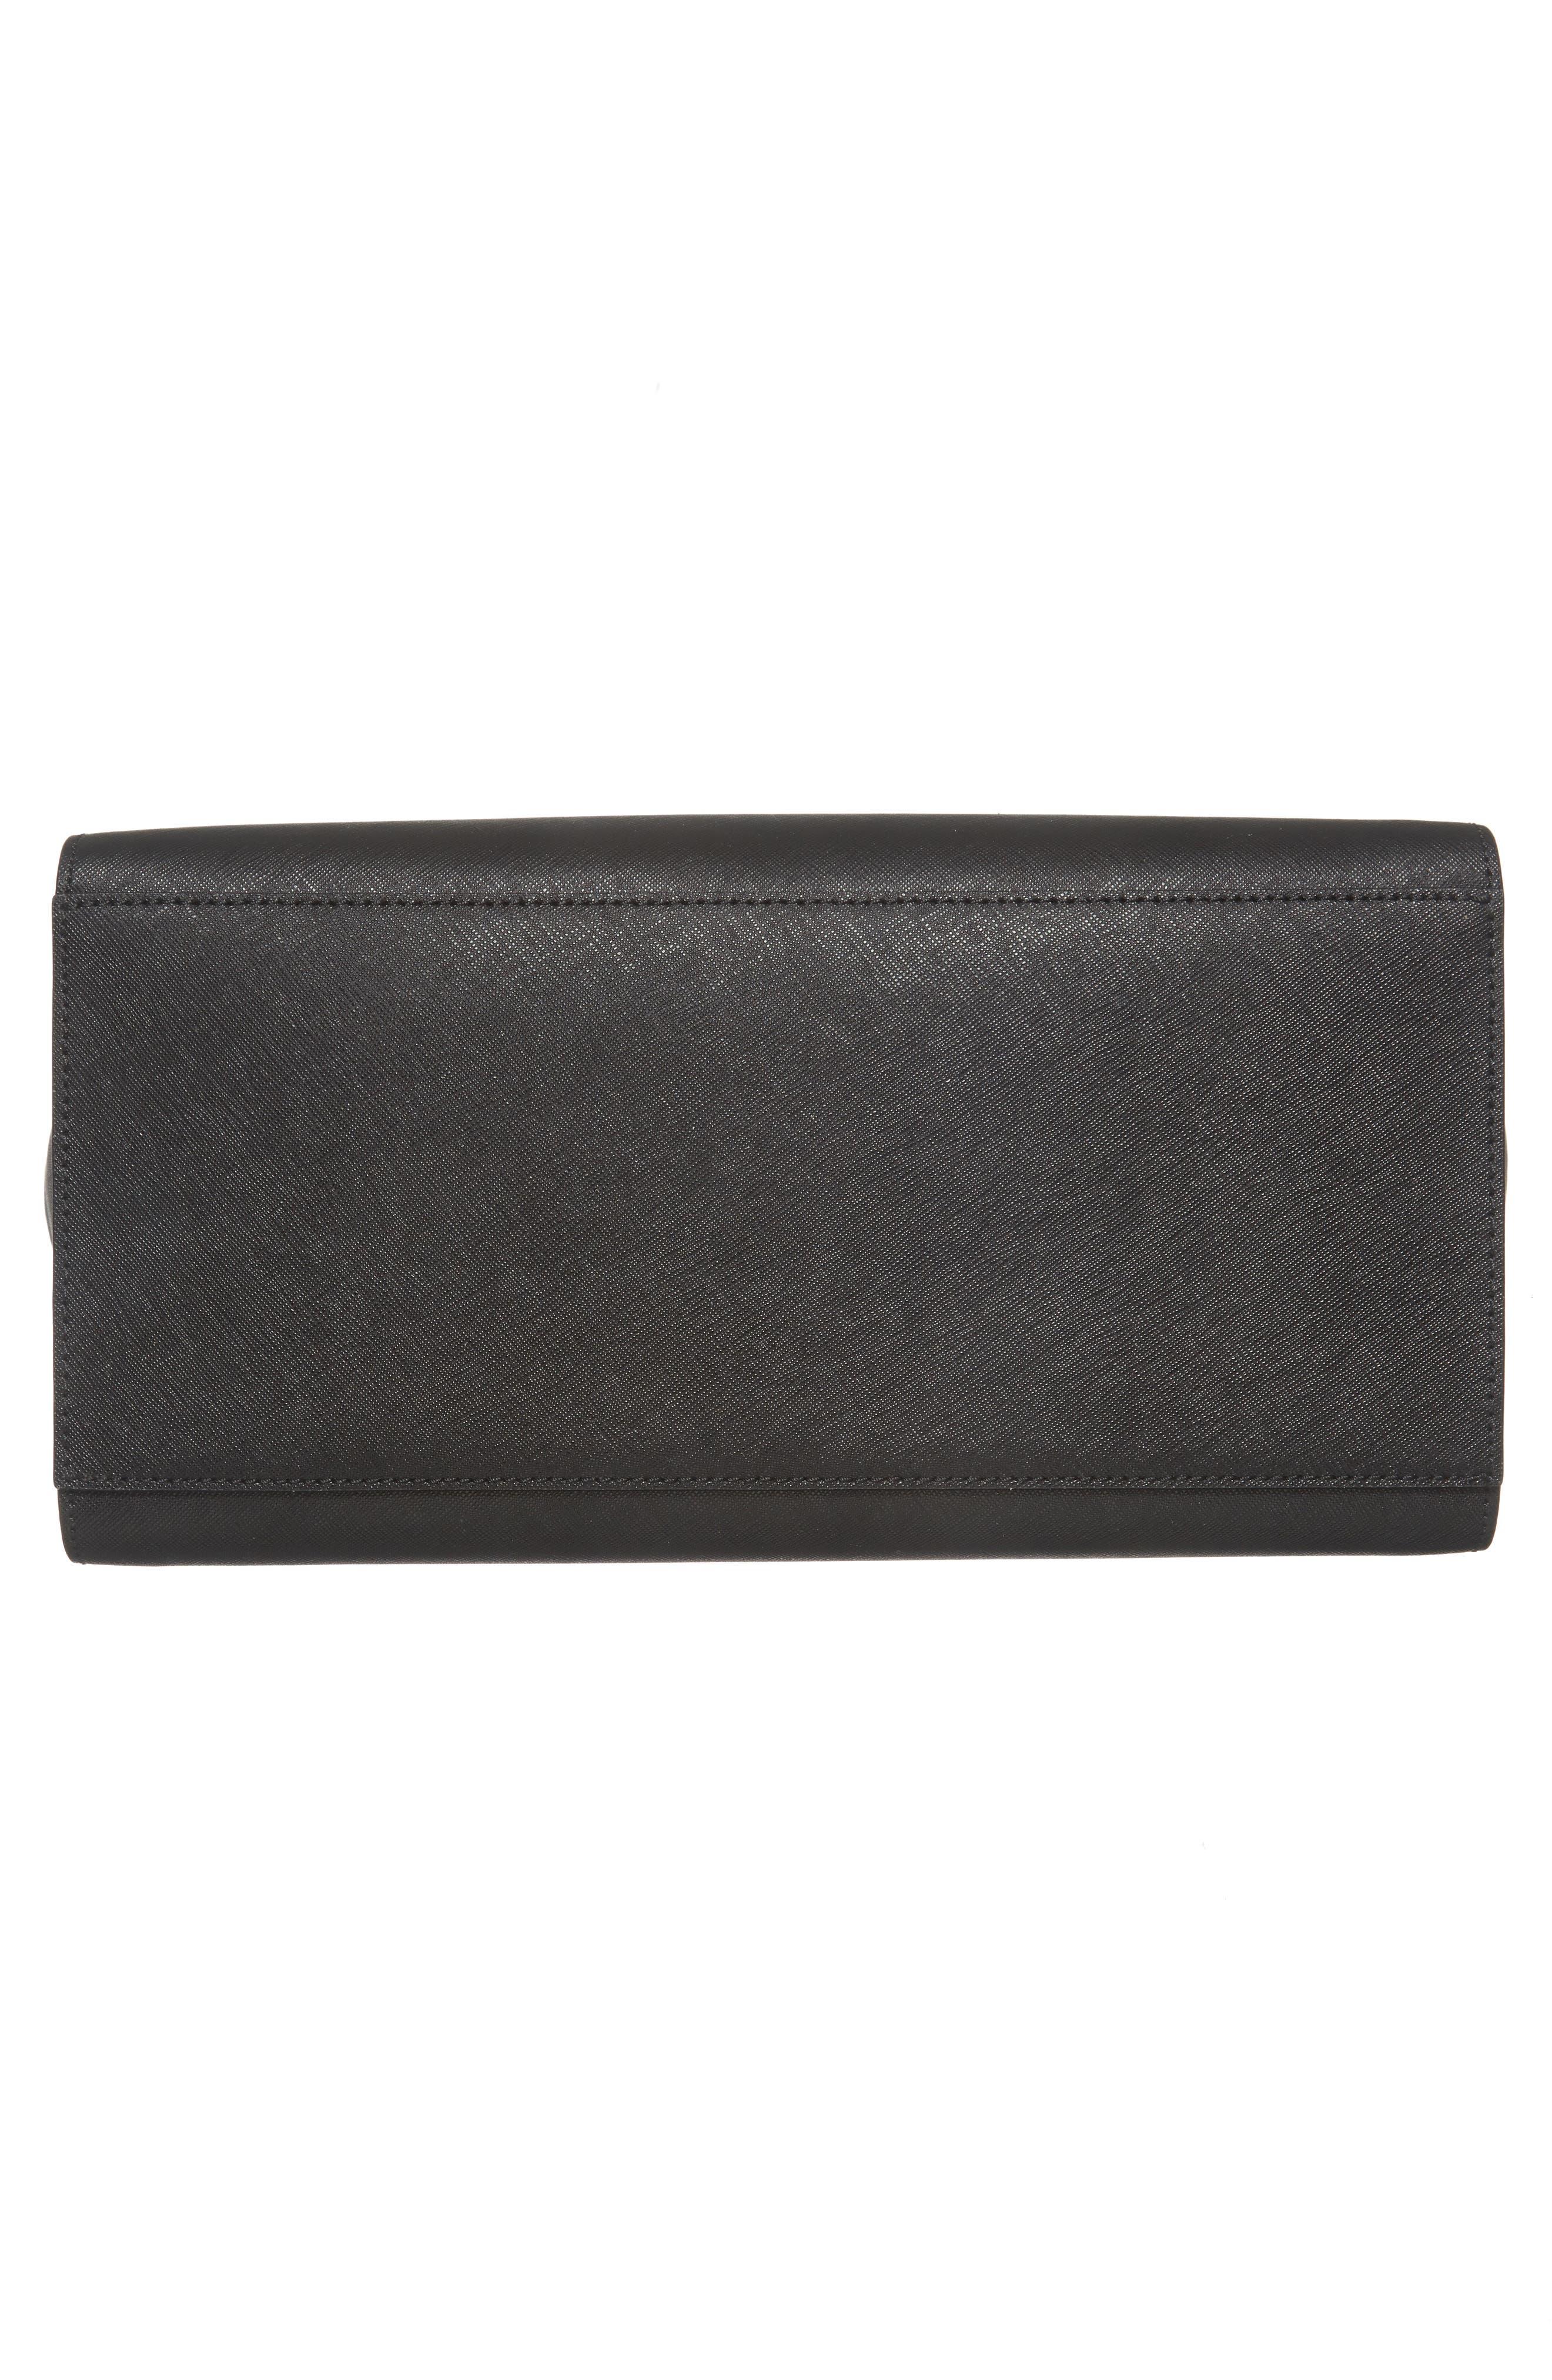 make it mine - candace leather satchel,                             Alternate thumbnail 6, color,                             001